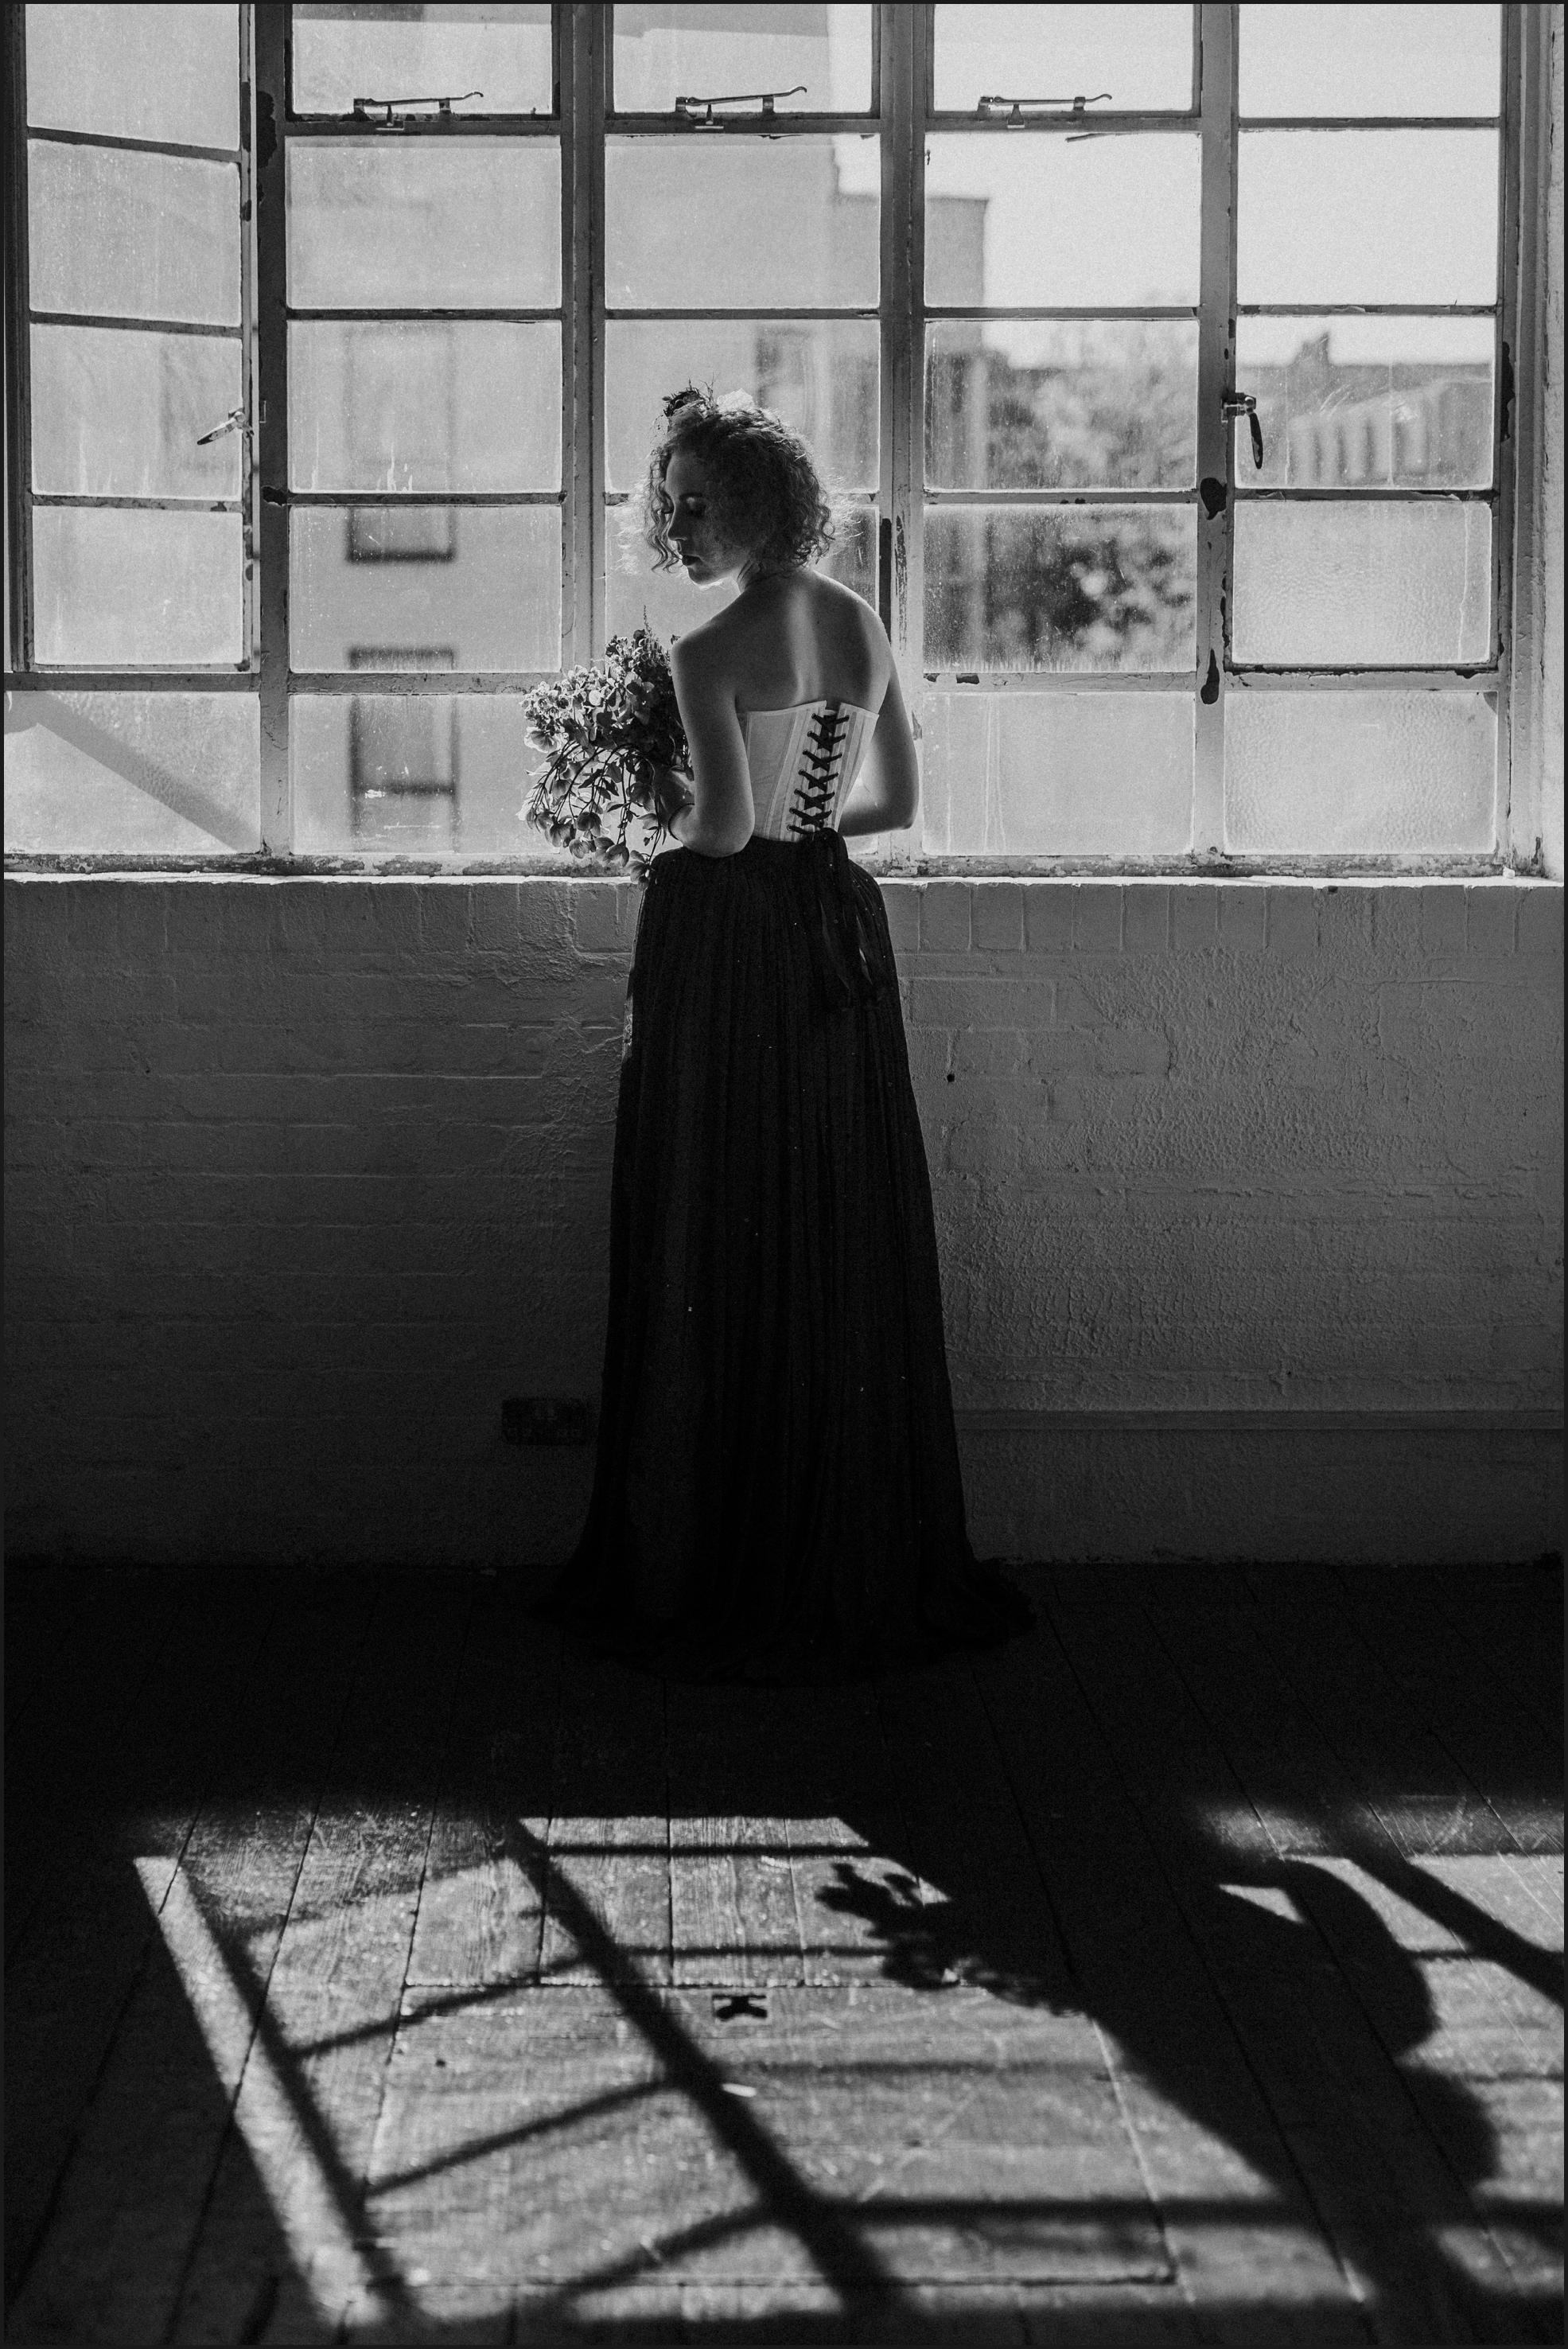 bride, window, light, wedding, windowpane, black and white